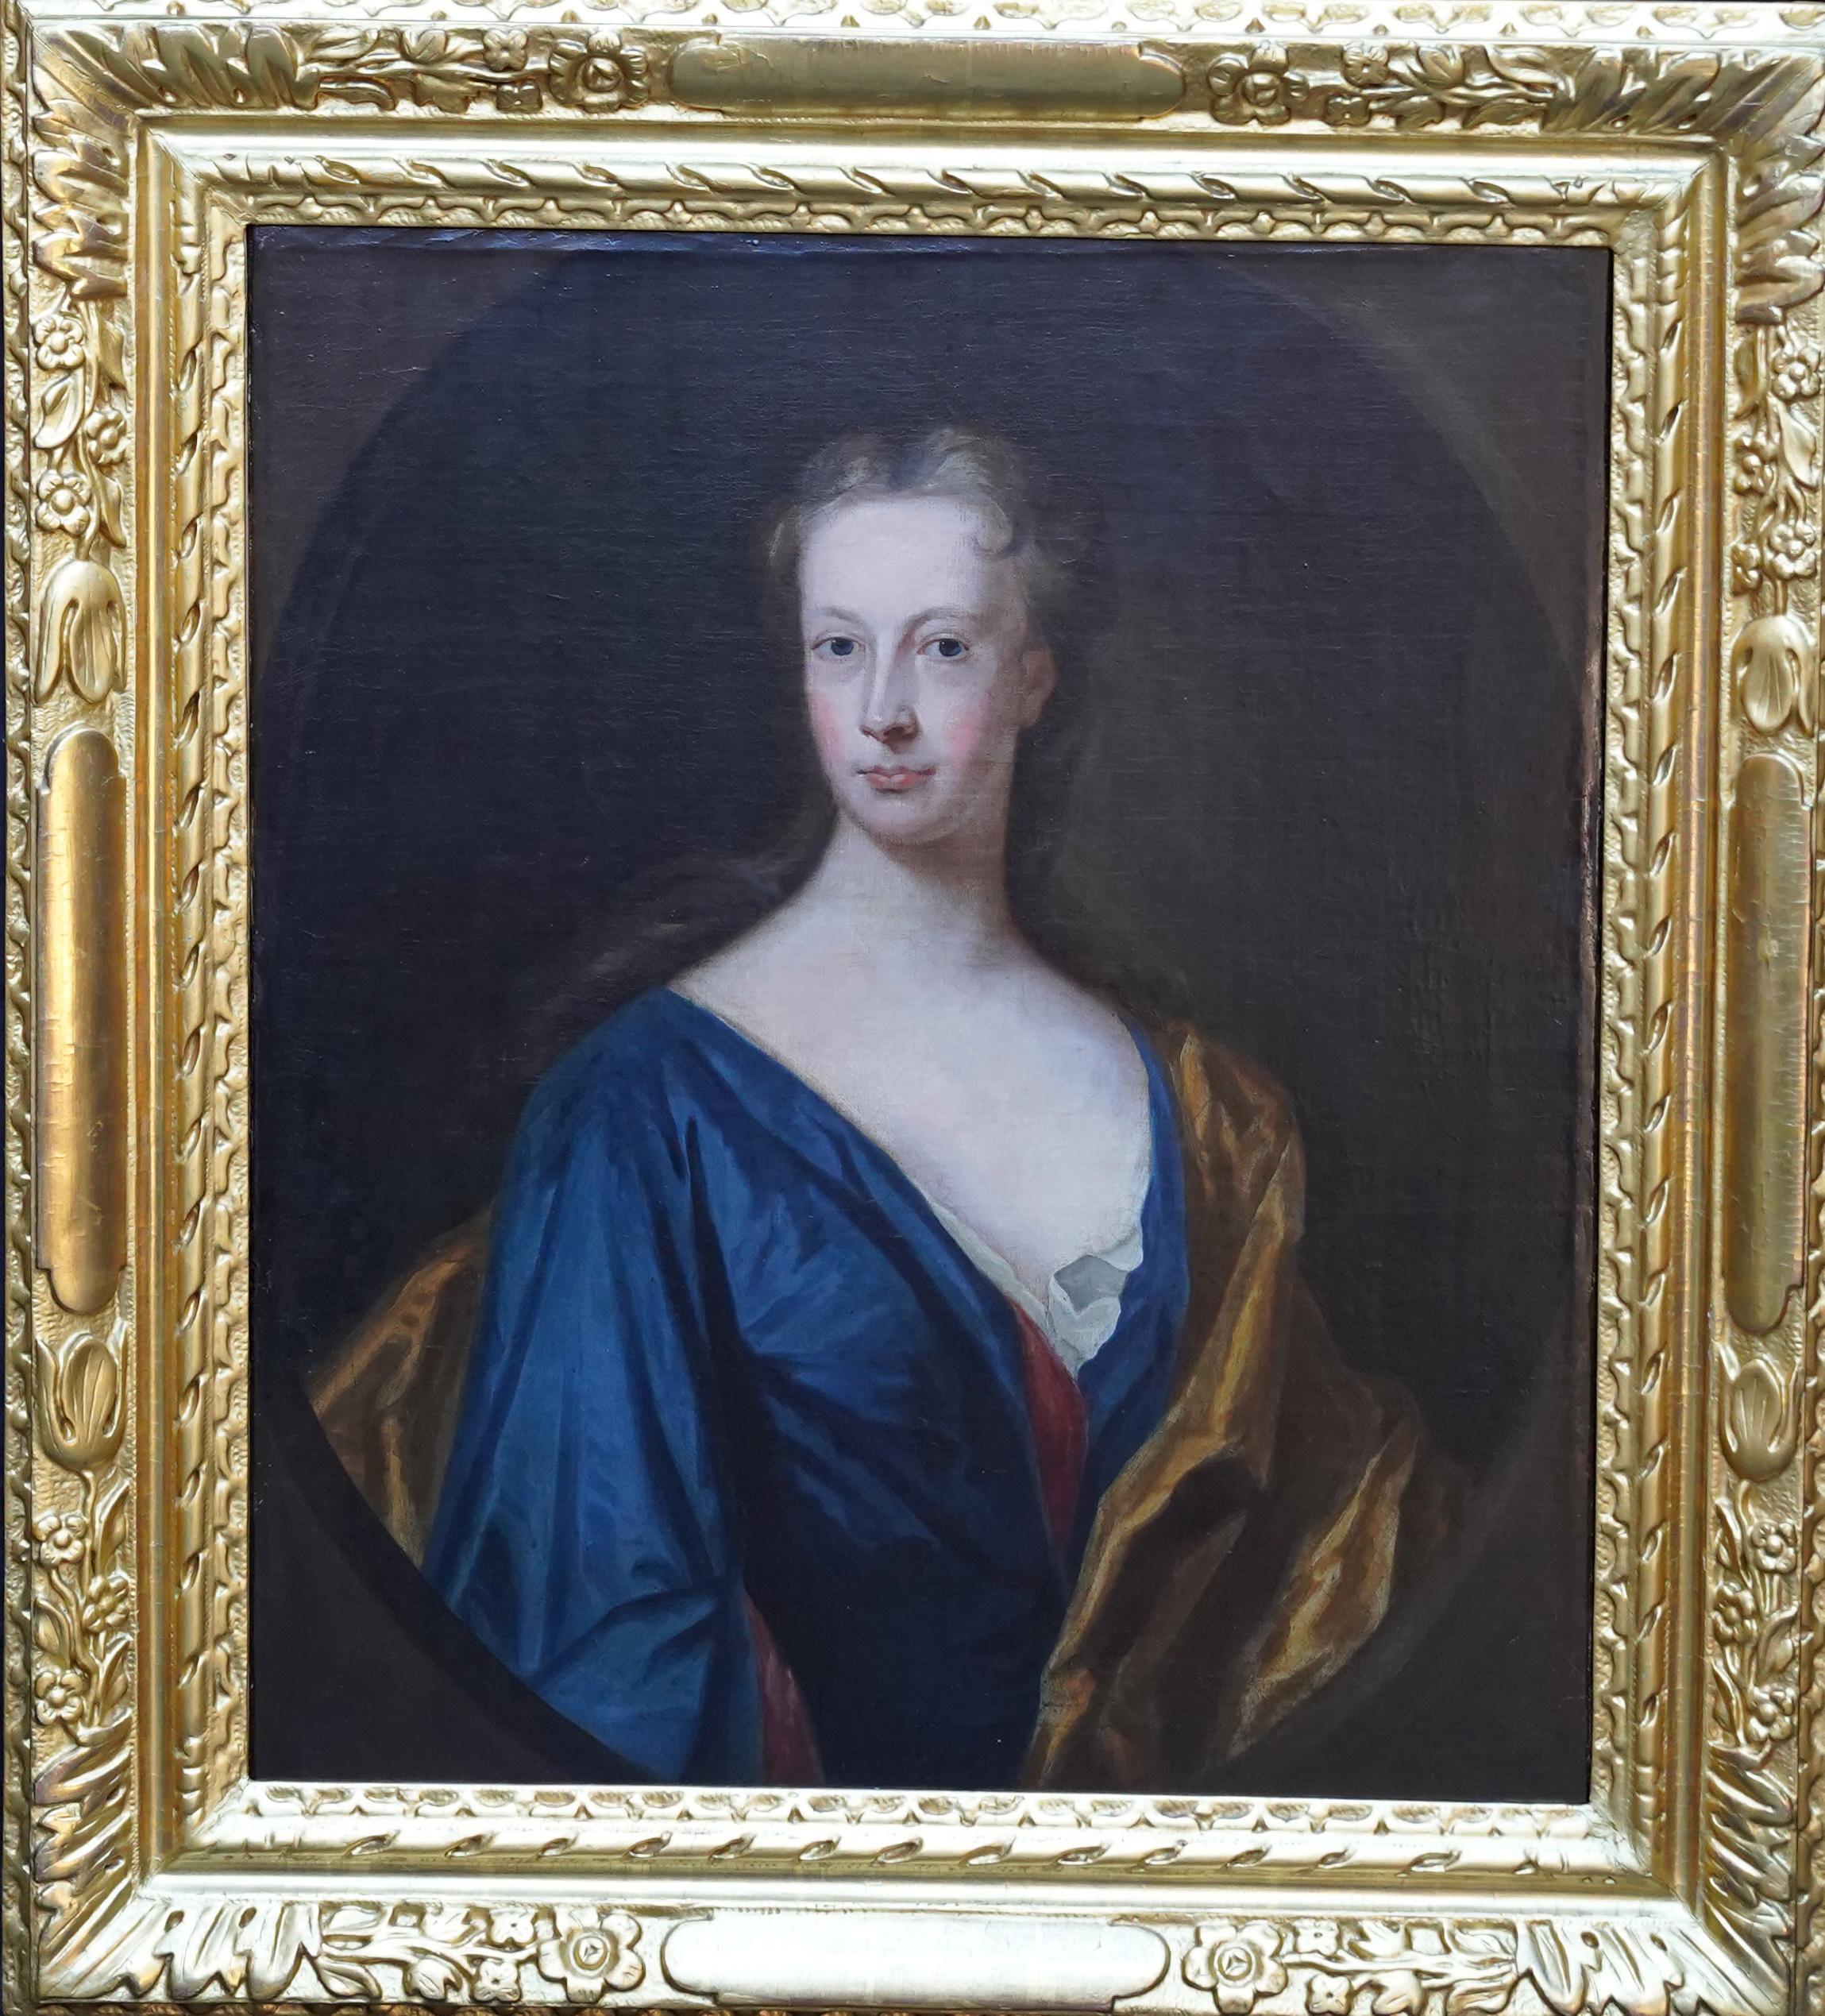 Portrait of Rachel Missing, Edinburgh - British Old Master art oil painting